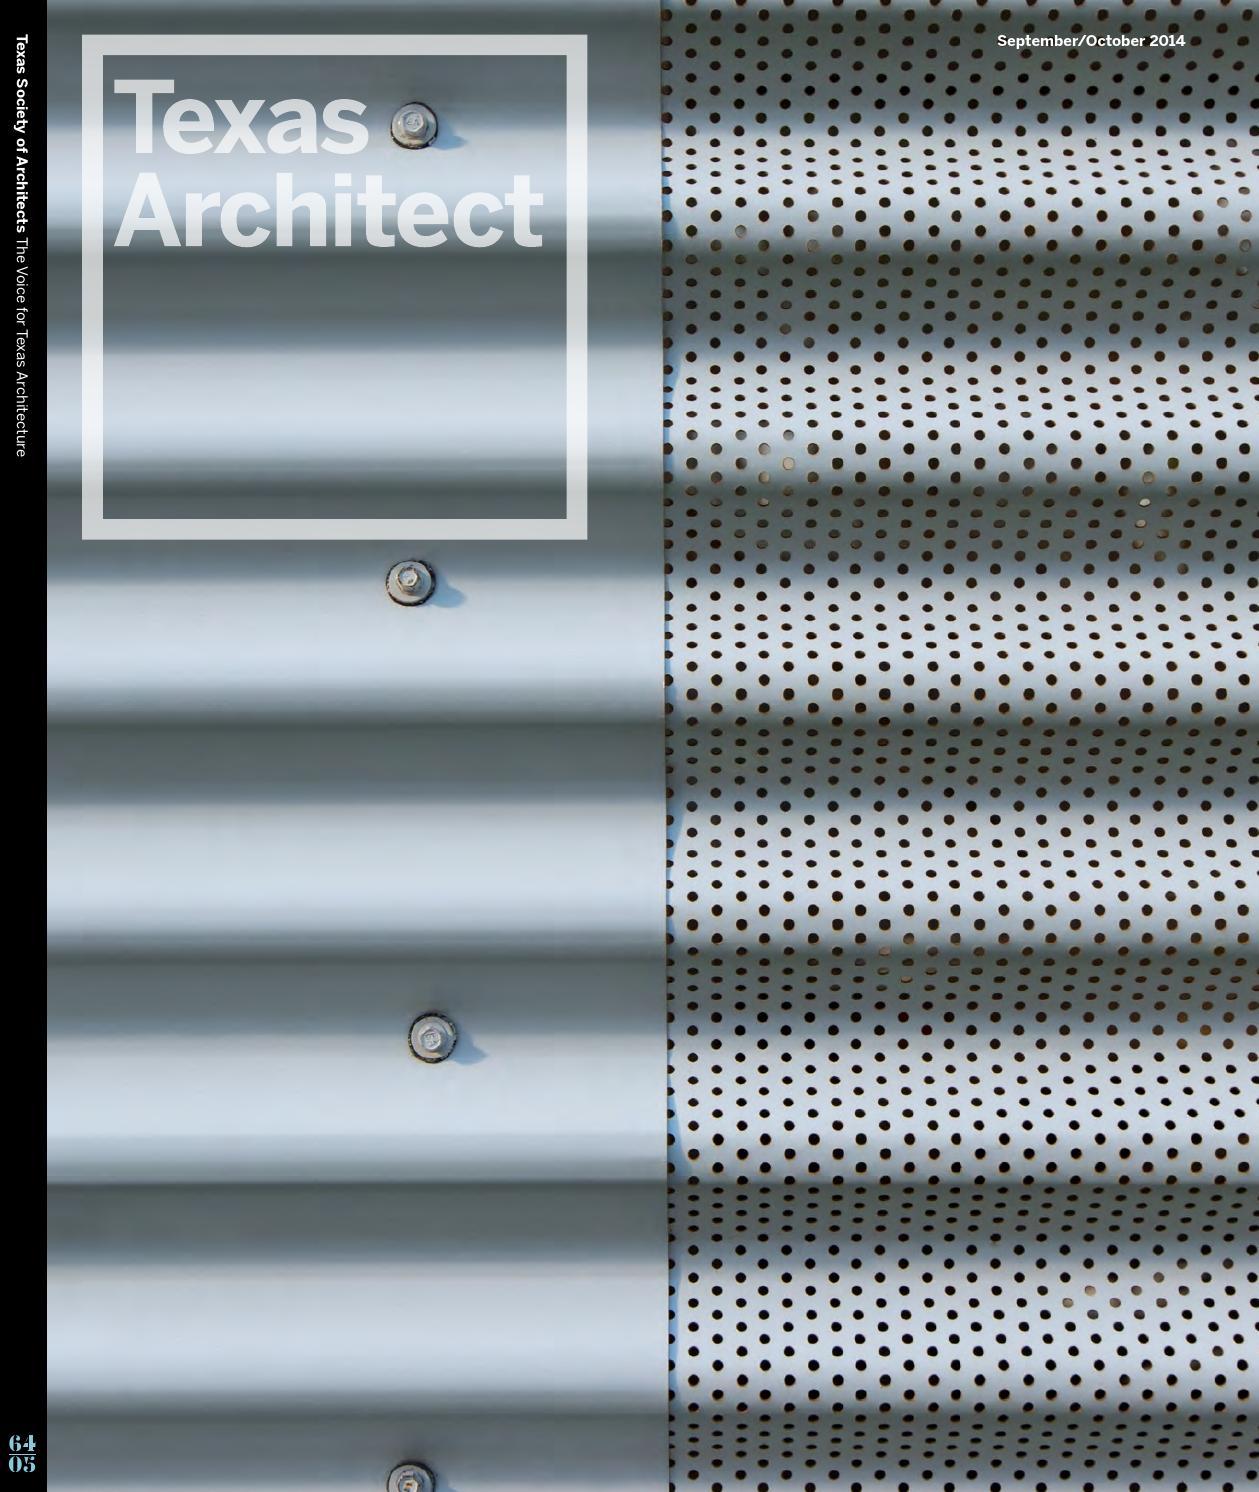 Texas Architect September/October 2014: Design Awards by Texas ...